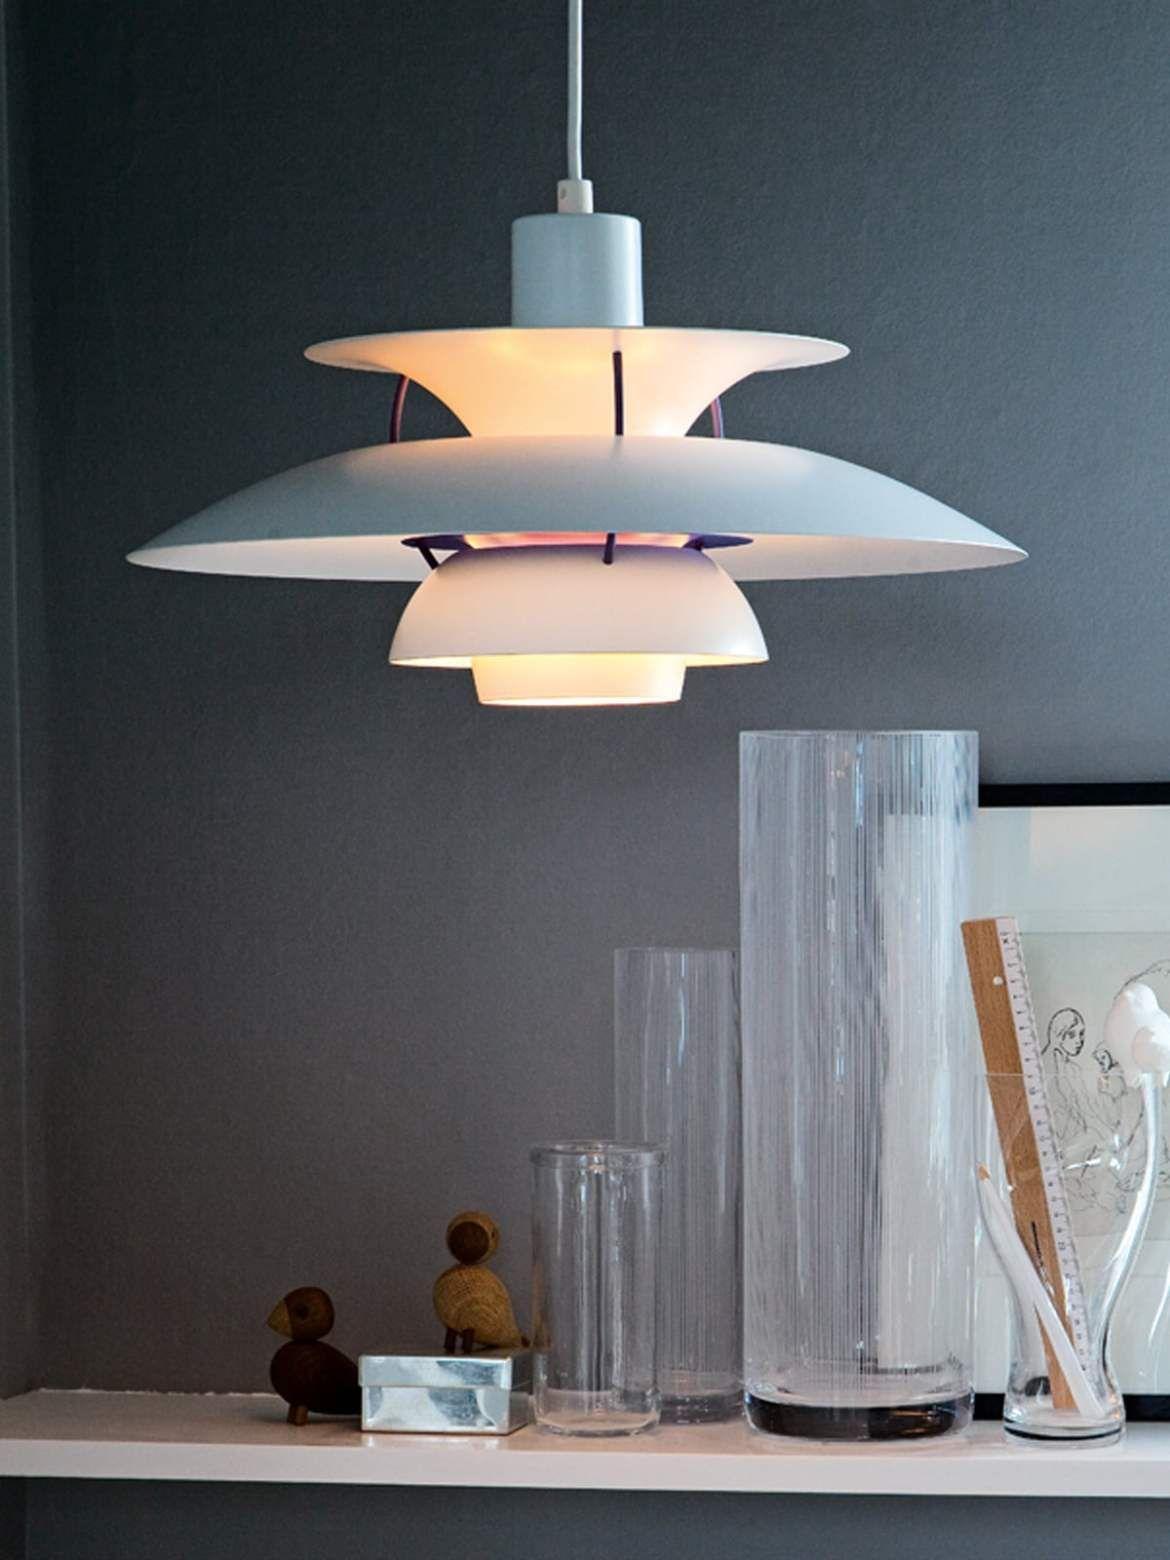 Klassische Designerleuchten Lampen Leuchten Ph Lampen Replica Poulsen Designerleuchten Designklas In 2020 Diy Pendant Lamp Diy Pendant Light White Pendant Lamp